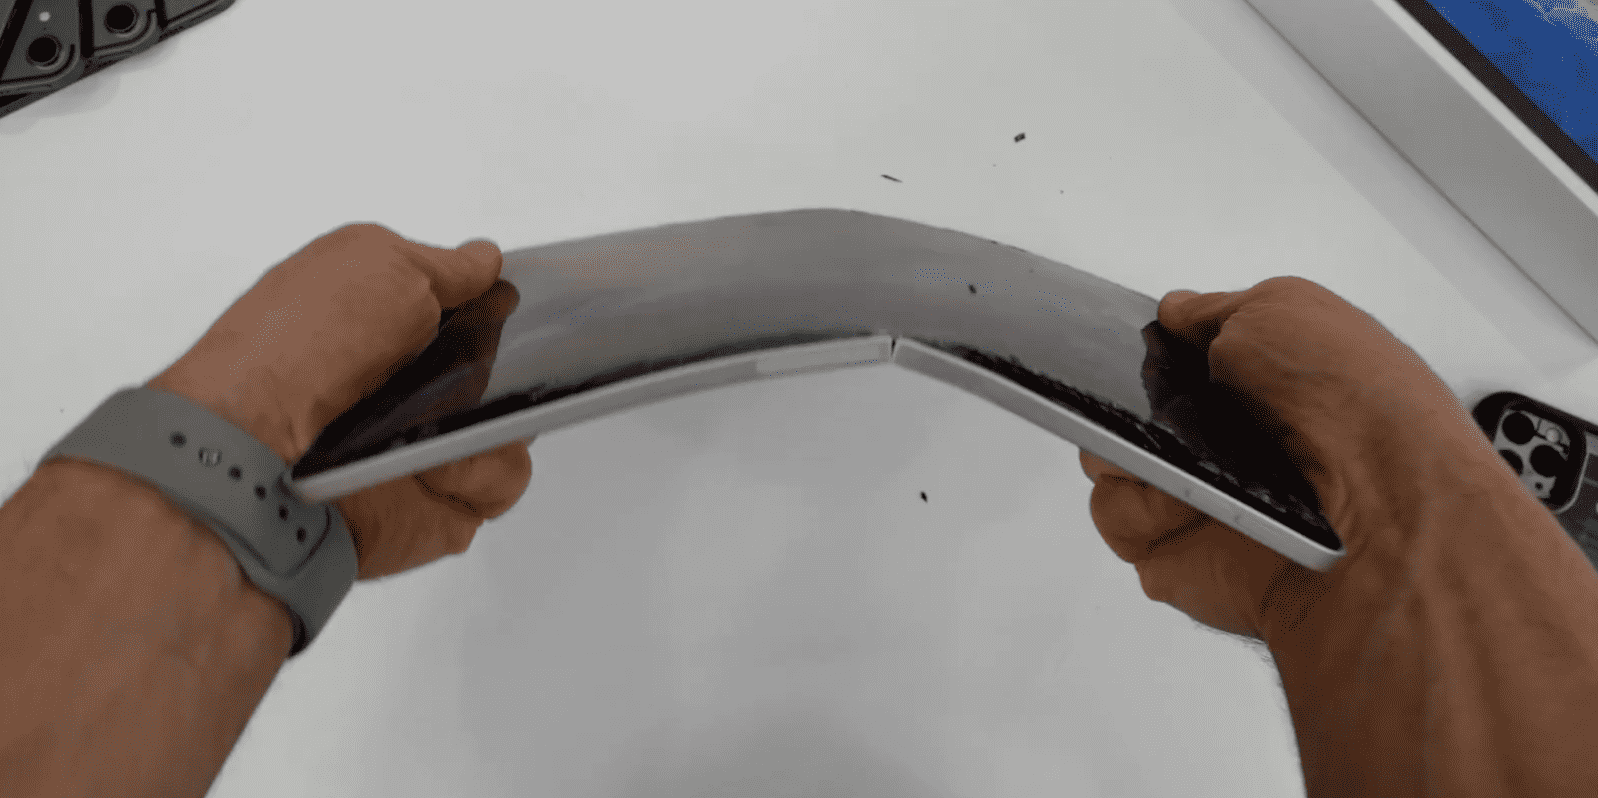 Ipad Pro 2020 Still Bend With Hand Img 1